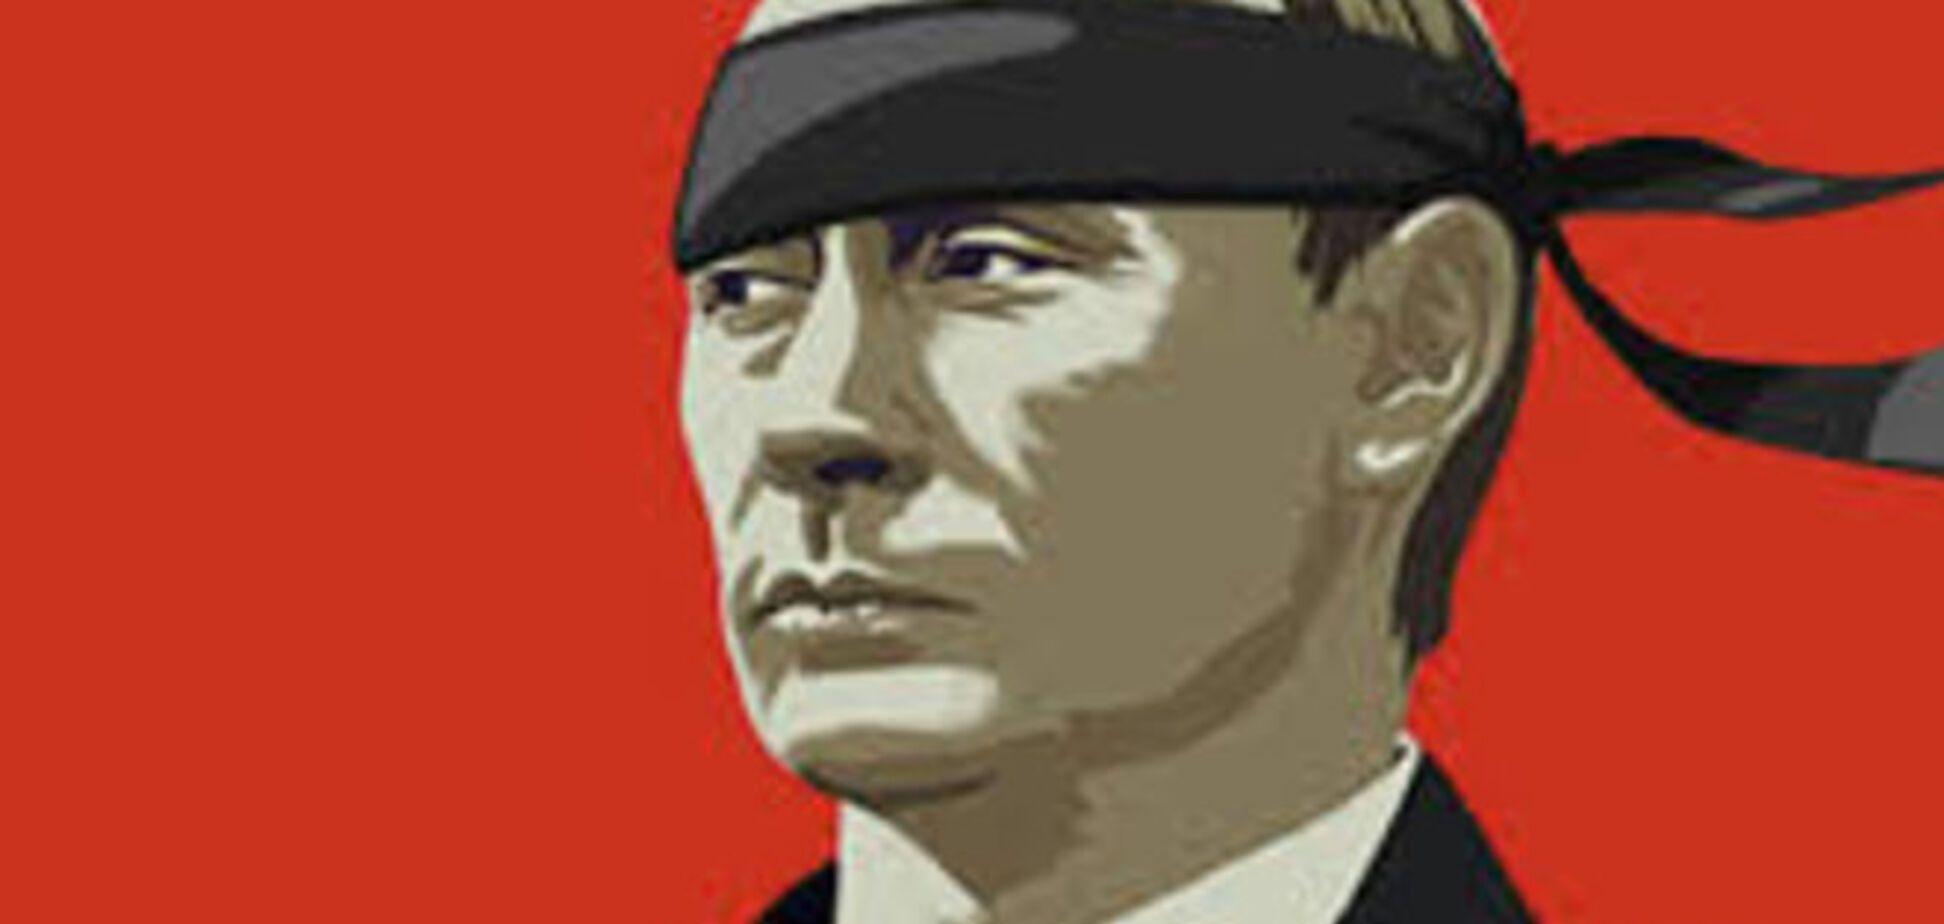 Всемирная утилизация путинизма